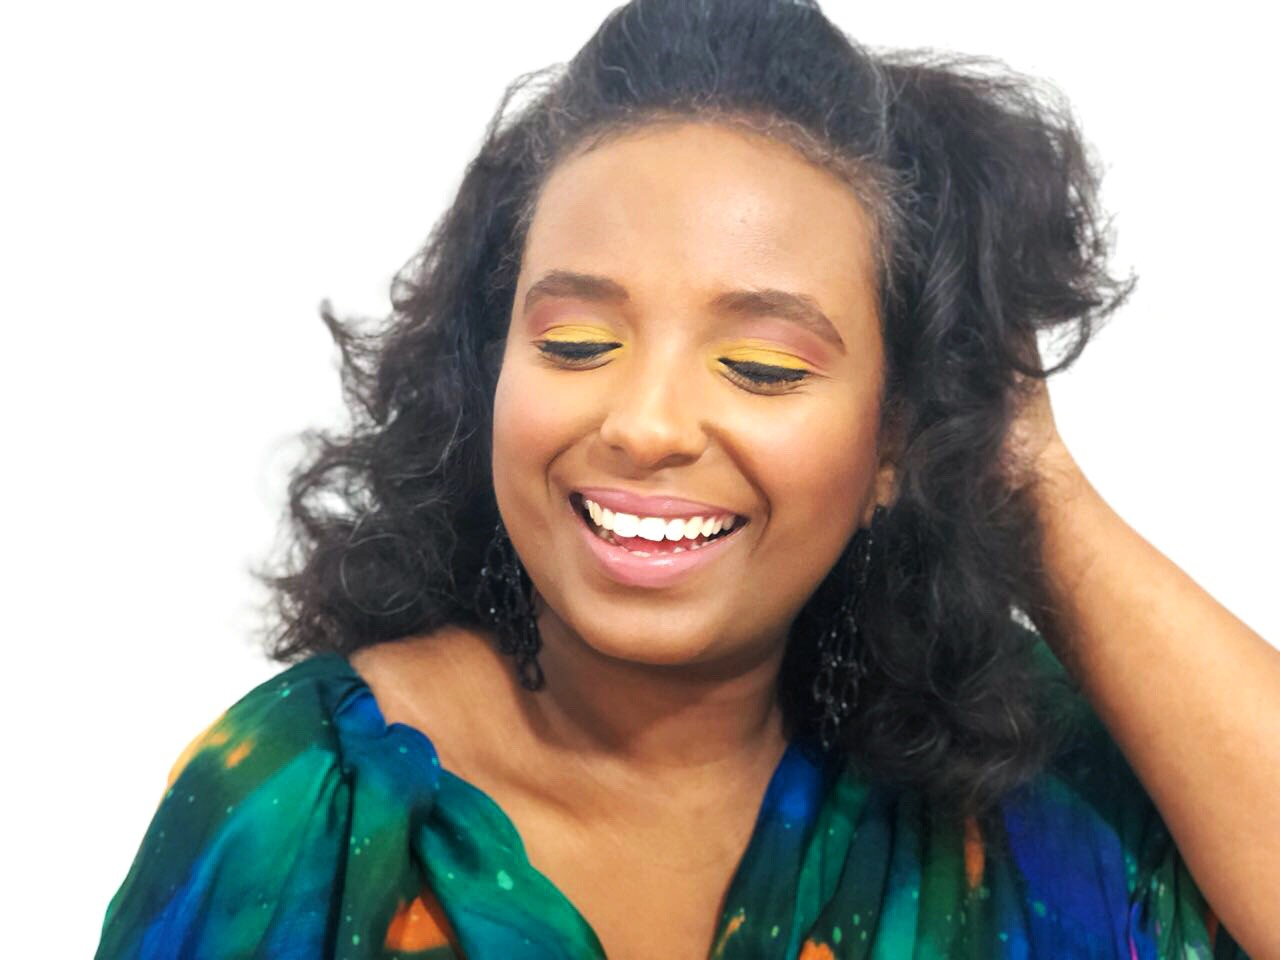 Oshinity huda beauty makeup blog review